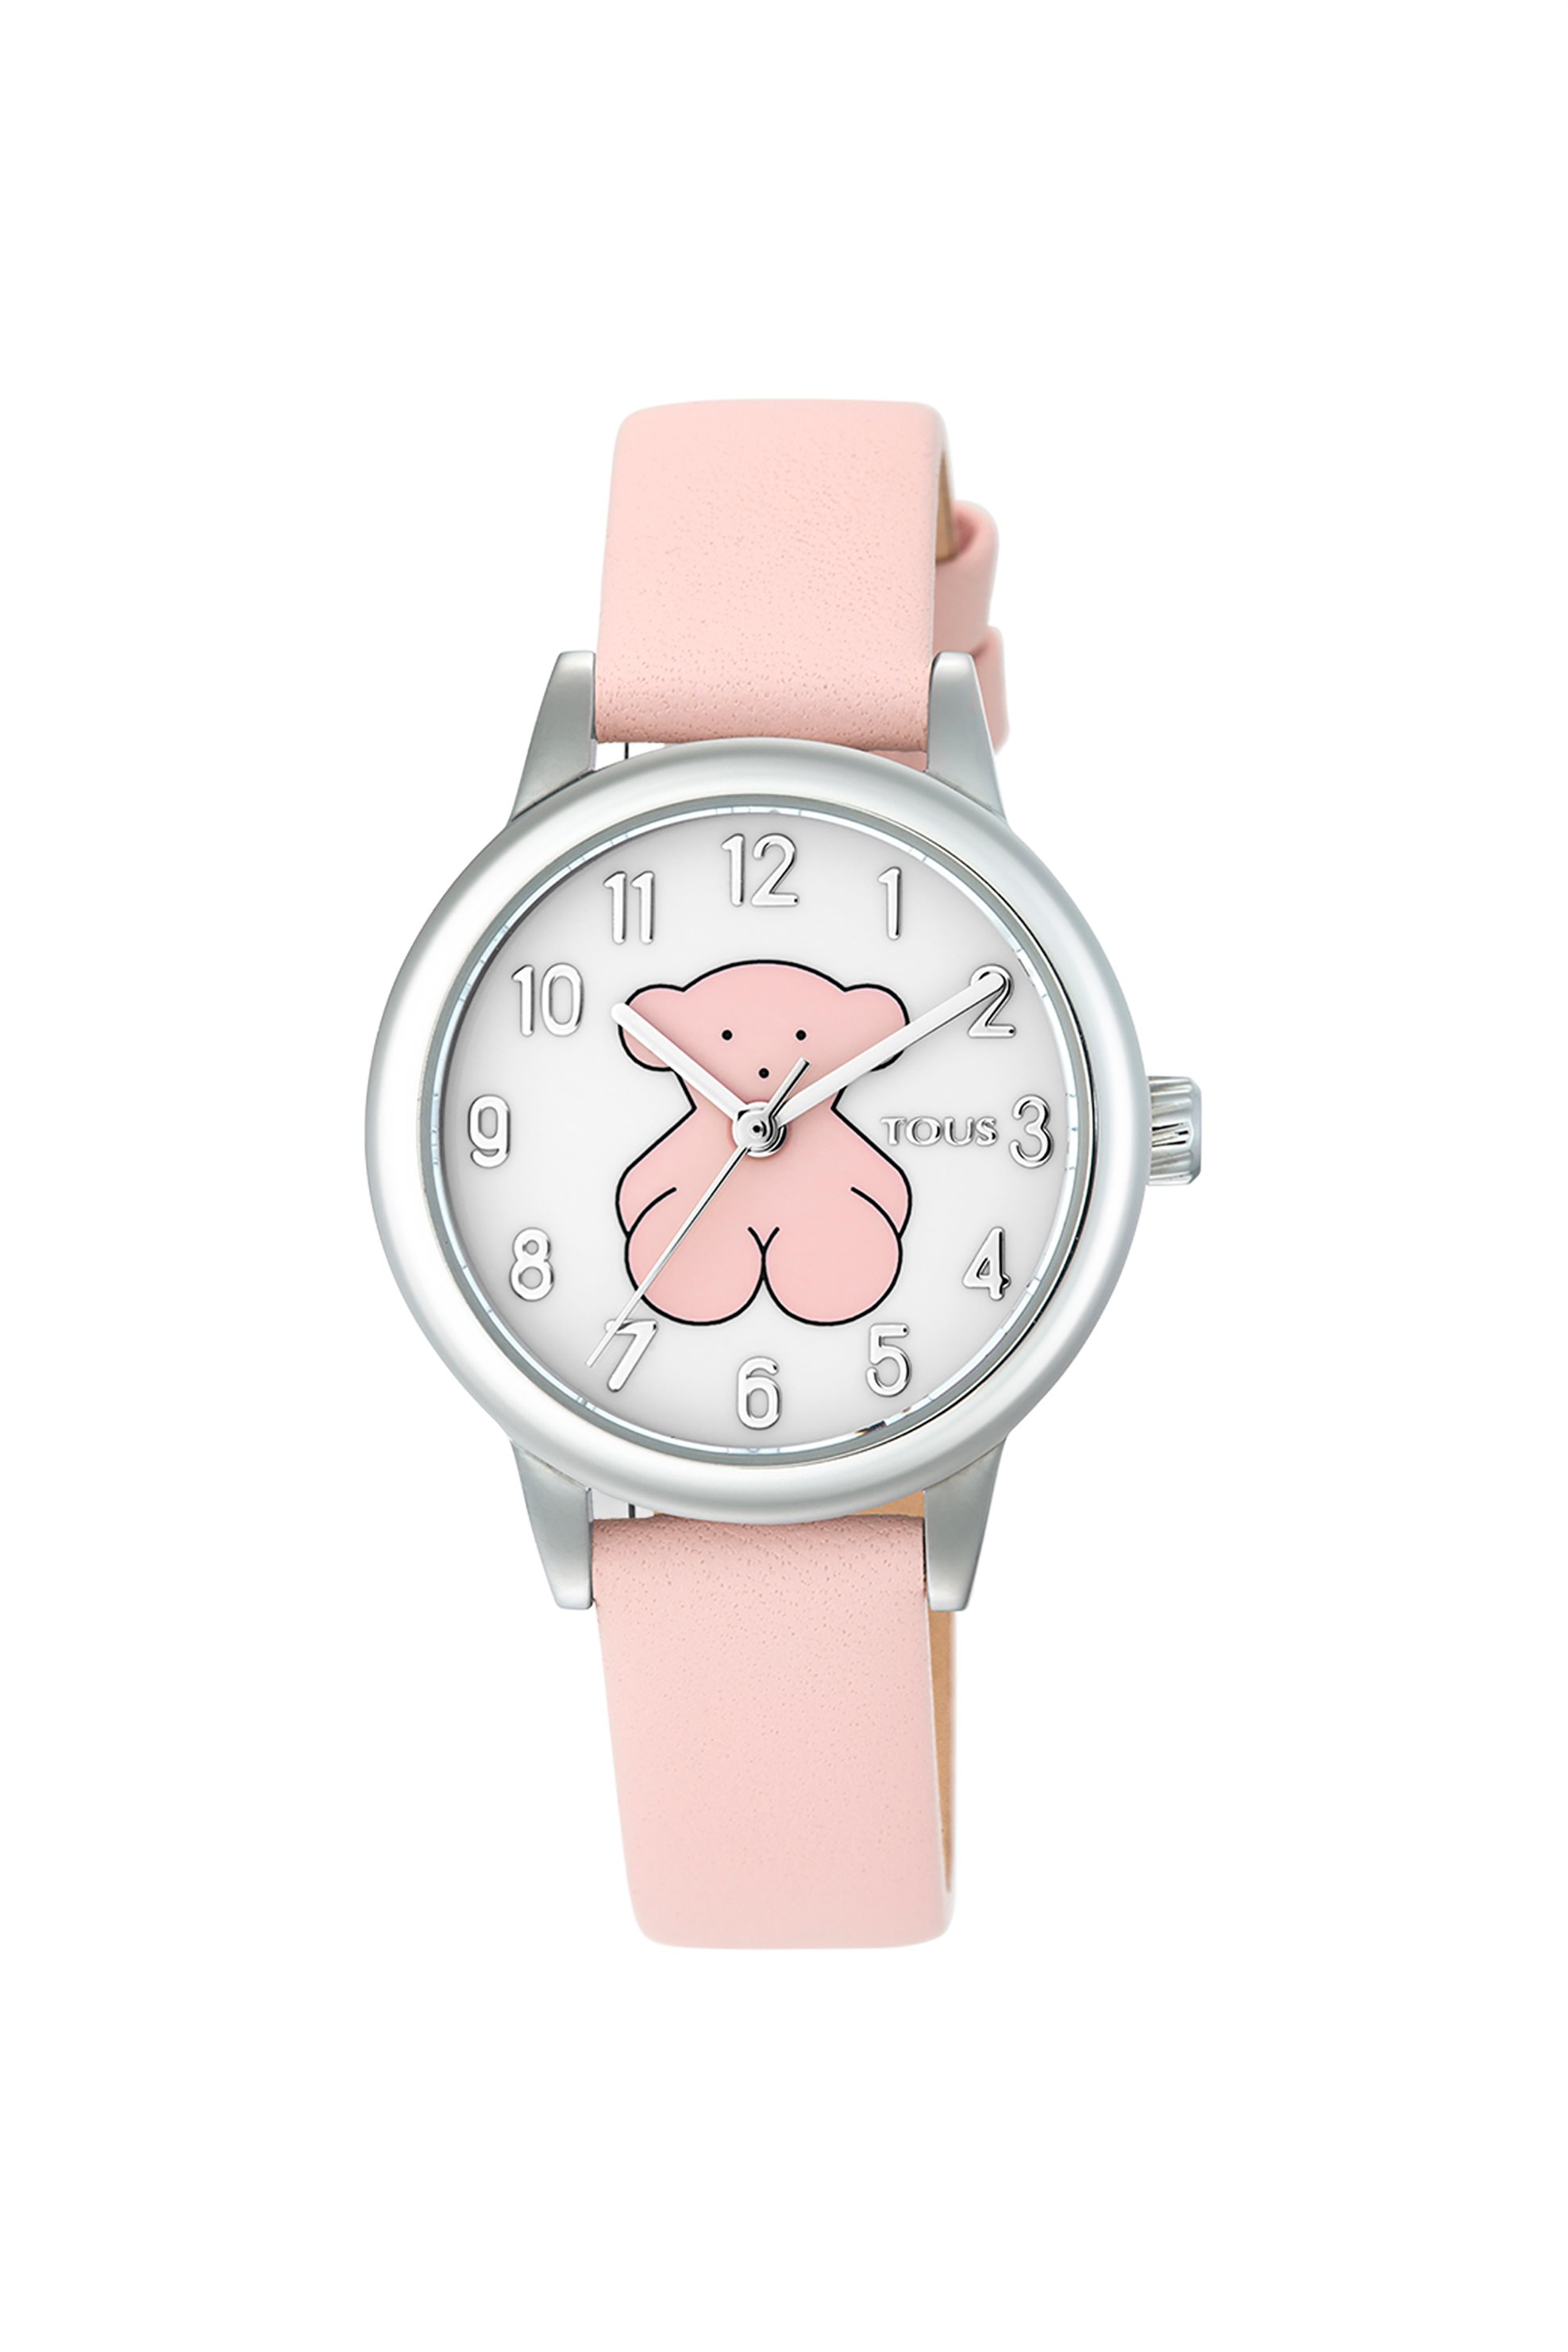 TOUS γυναικείο ρολόι New Muffin από Ατσάλι με ροζ Δερμάτινο λουράκι - 3000086900 - Ροζ